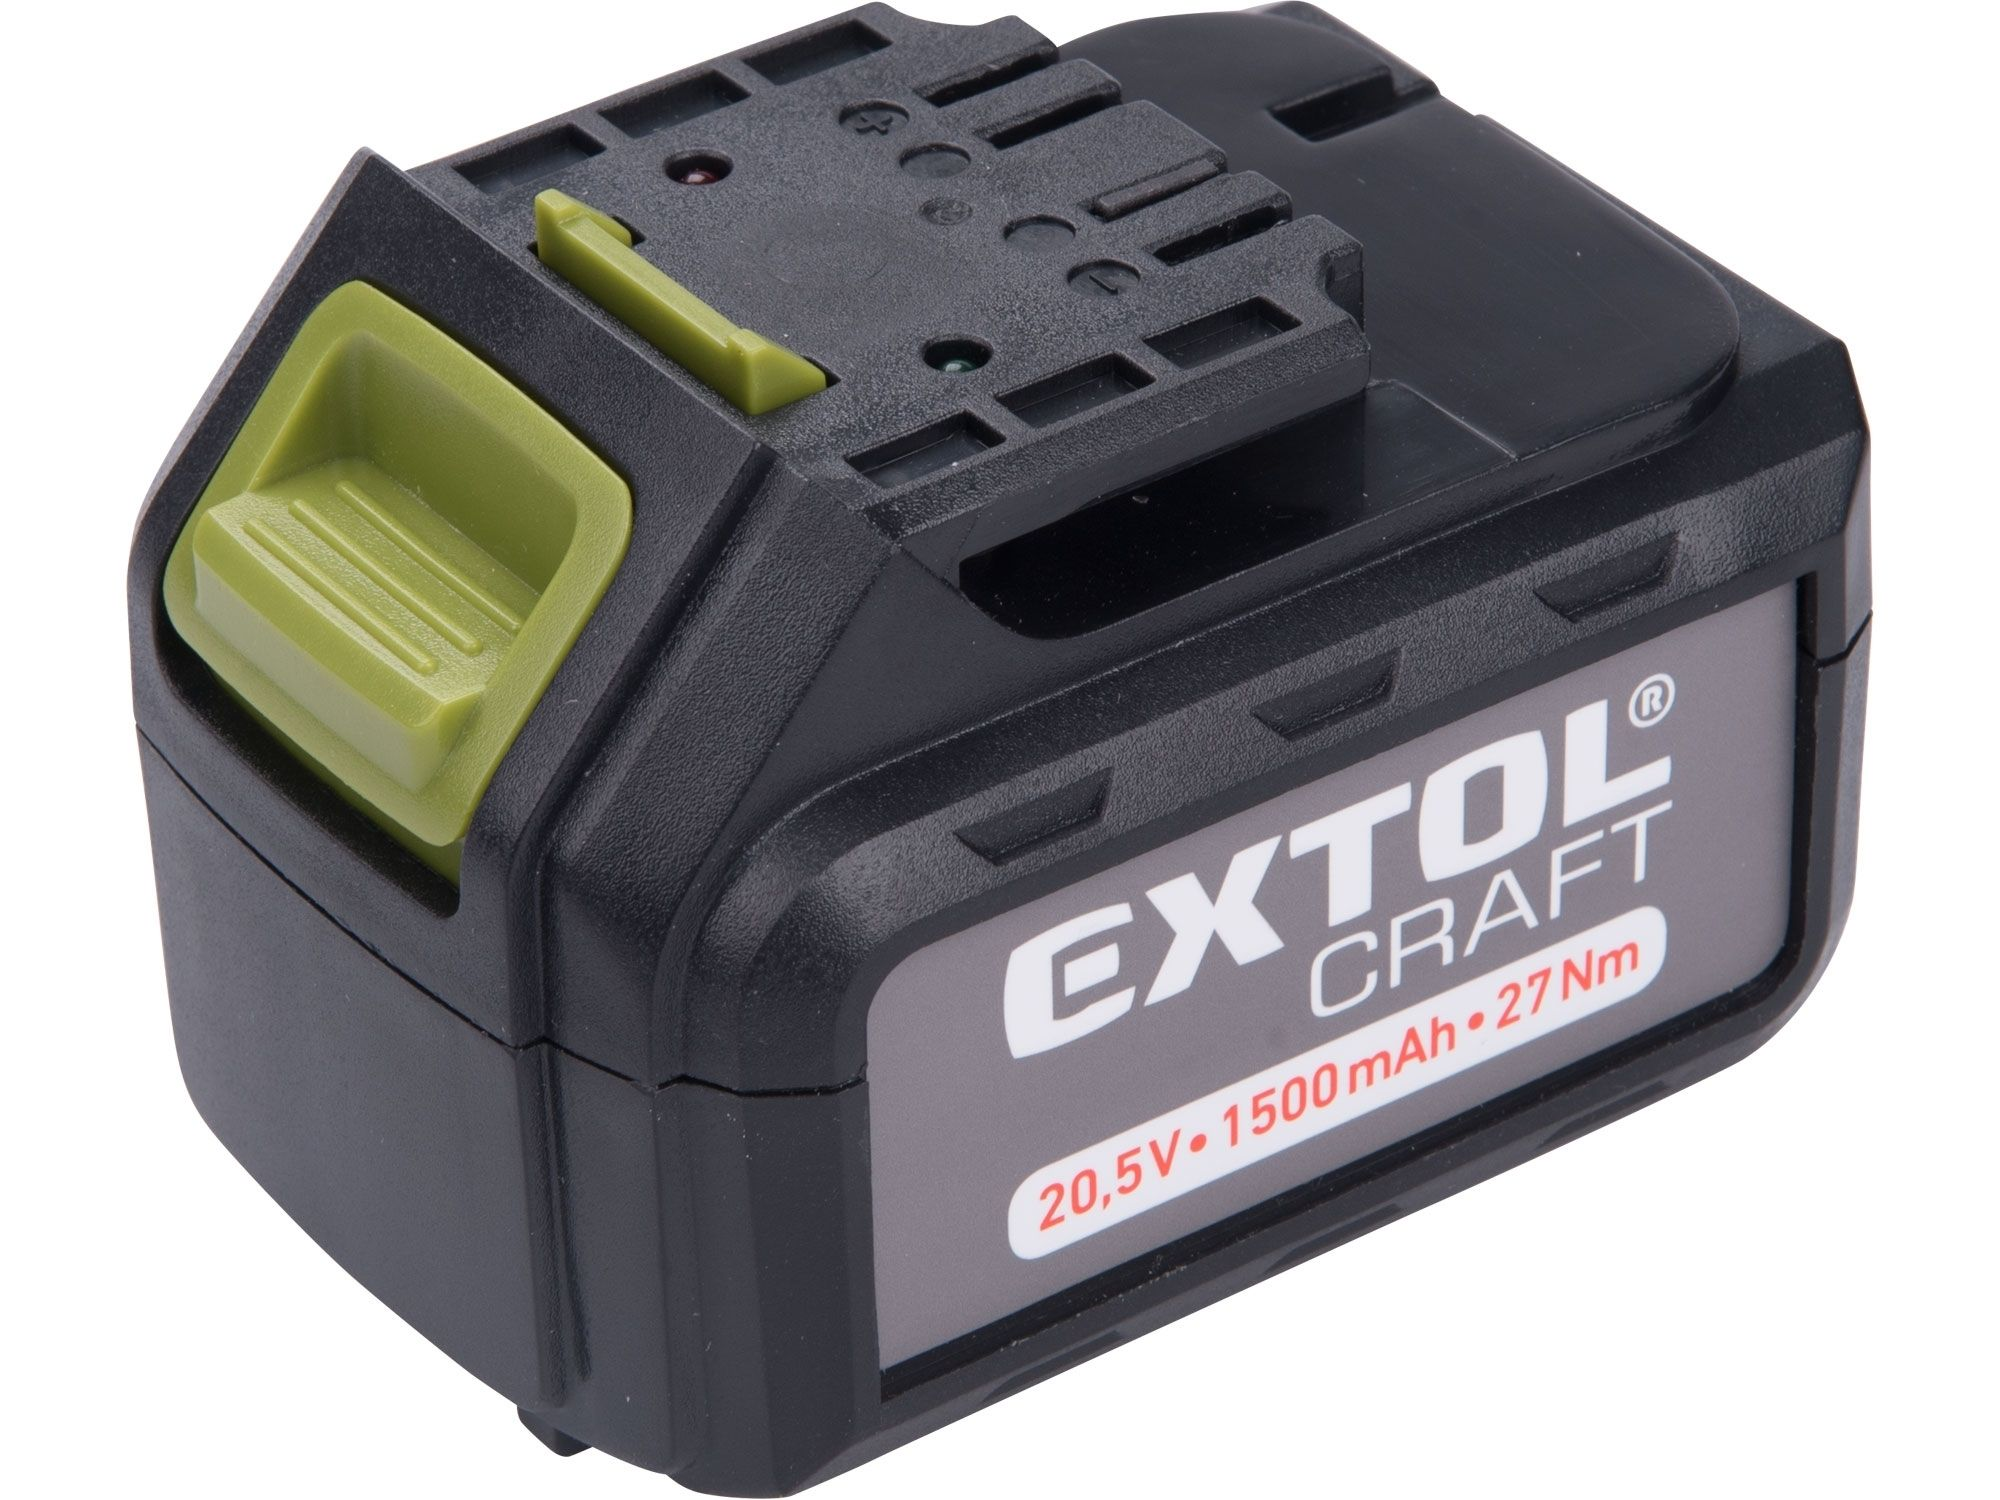 Baterie akumulátorová, 20V Li-ion, 1500mAh, pro 402440 EXTOL-CRAFT